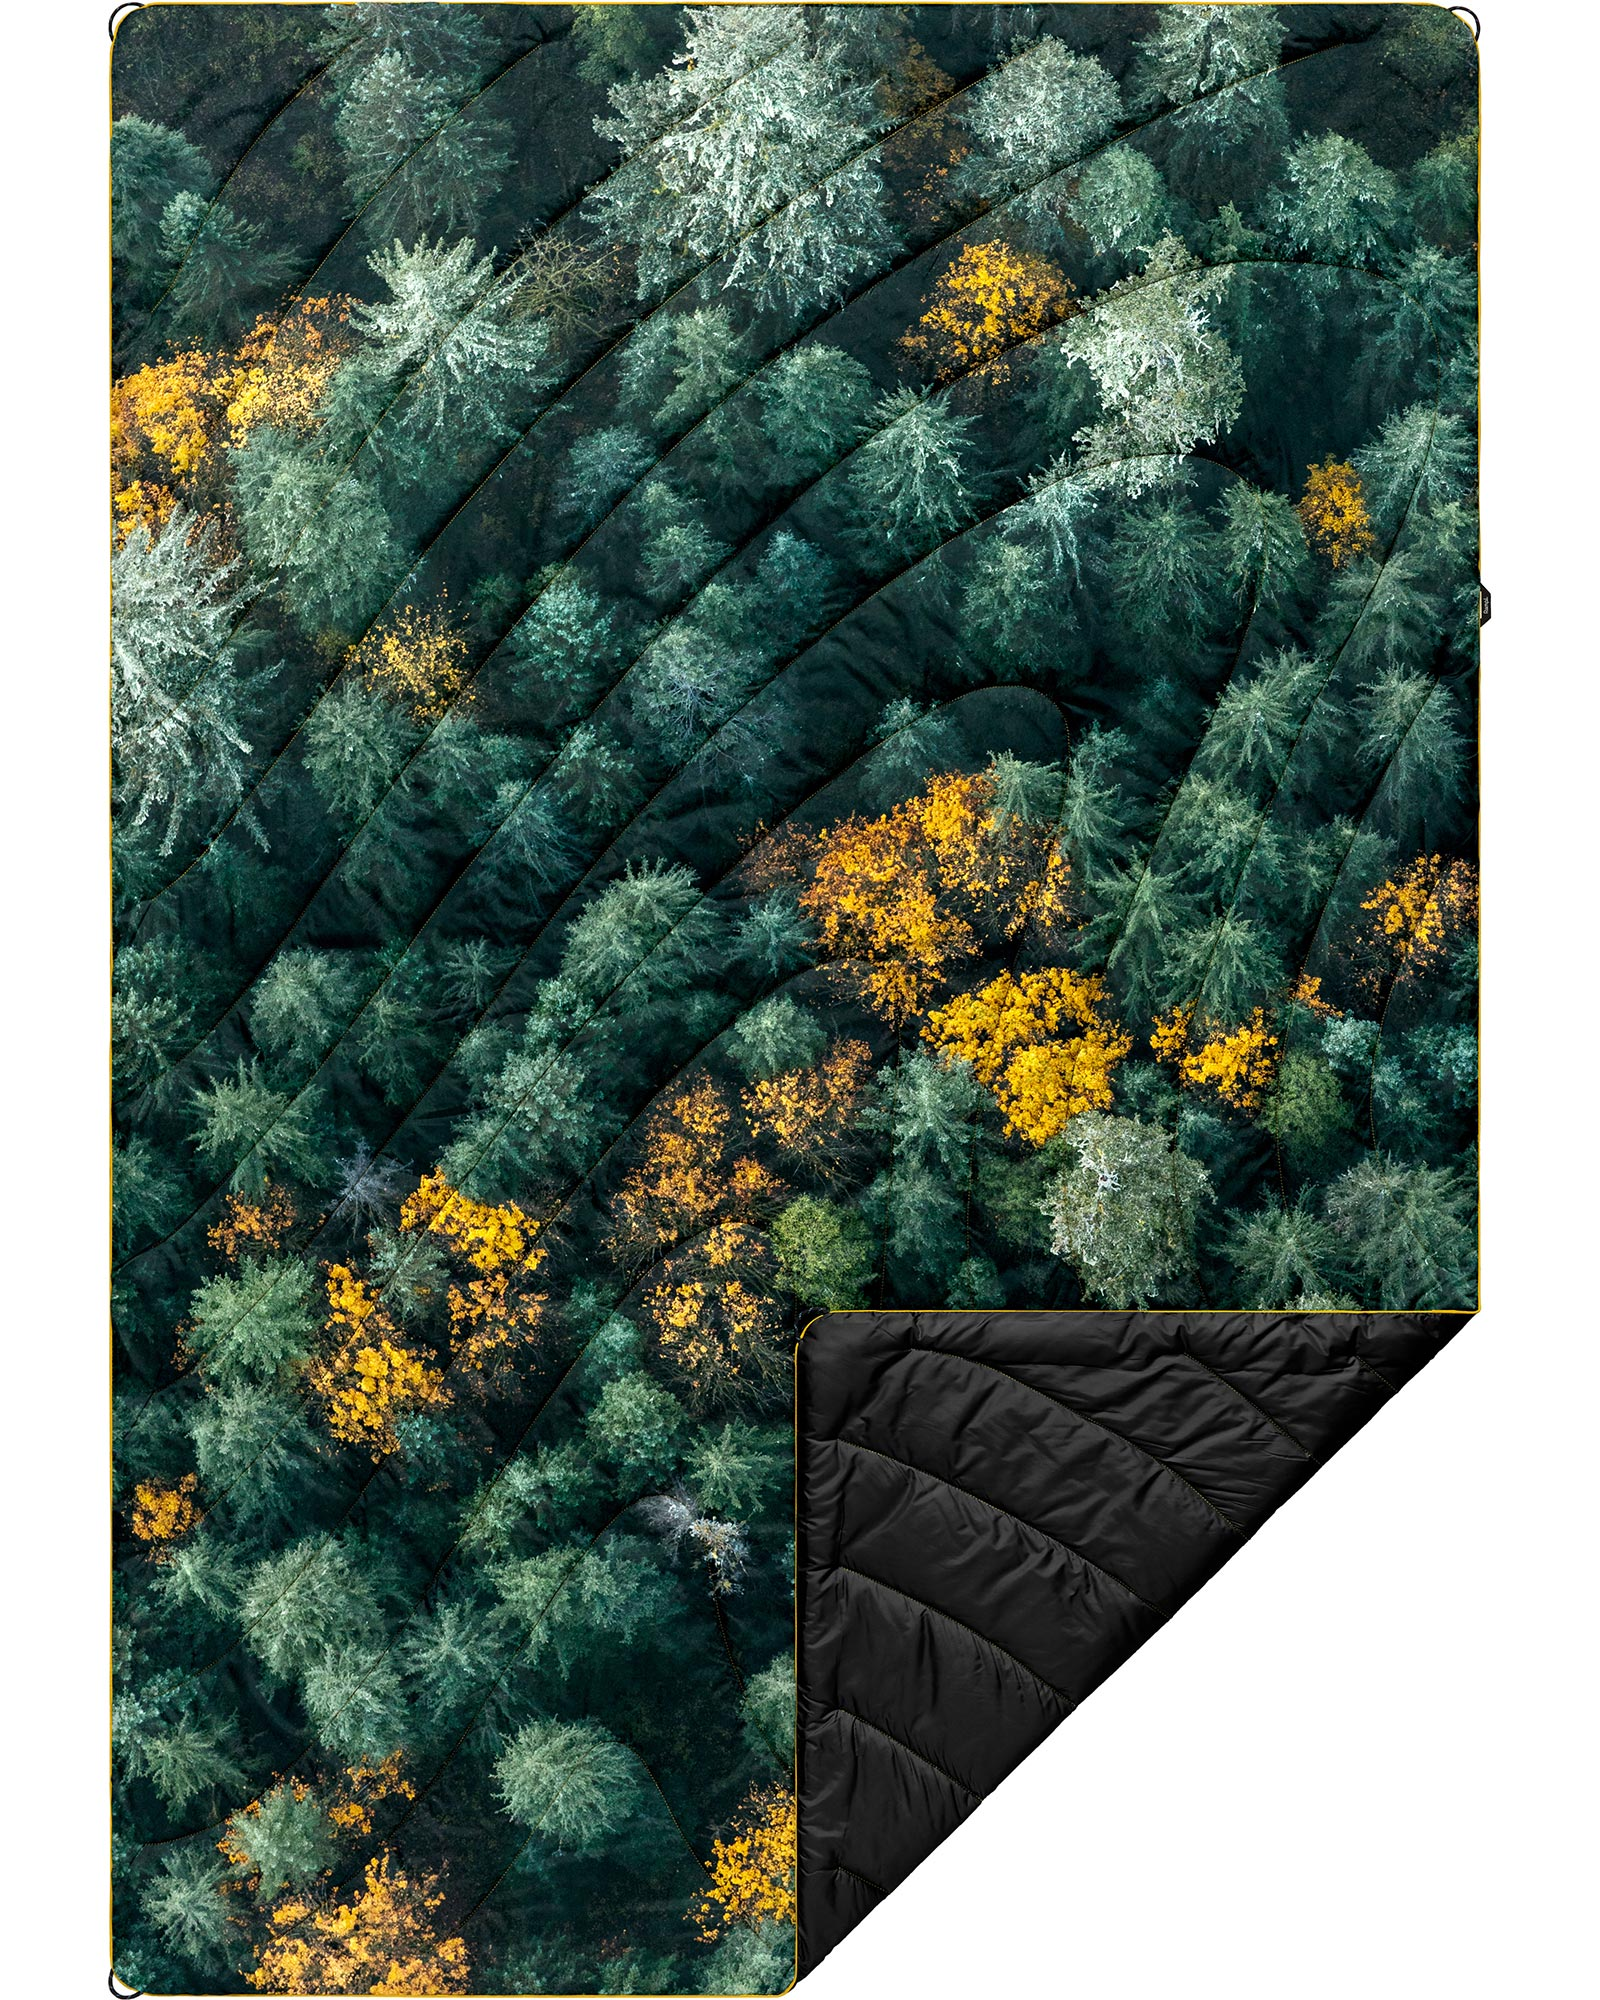 Salomon Guardian Crampons 115mm